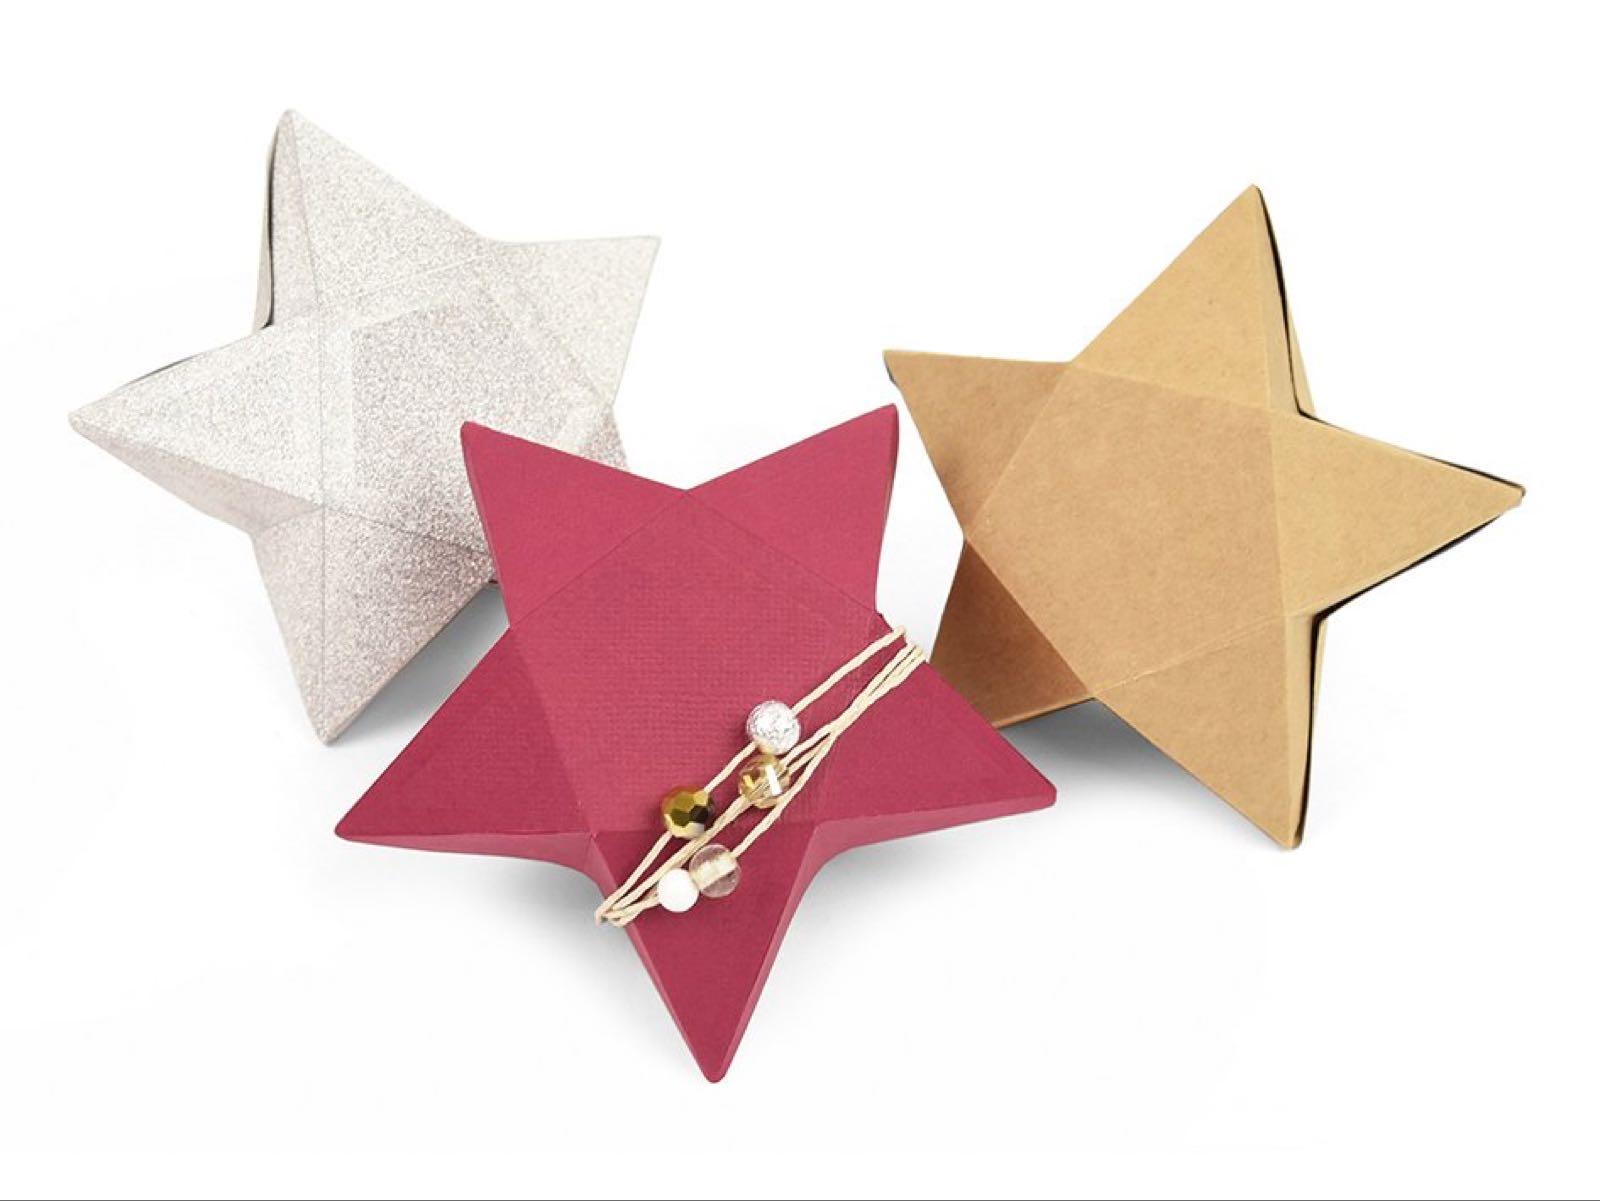 Sizzix Thinlits Plus die- Star Box